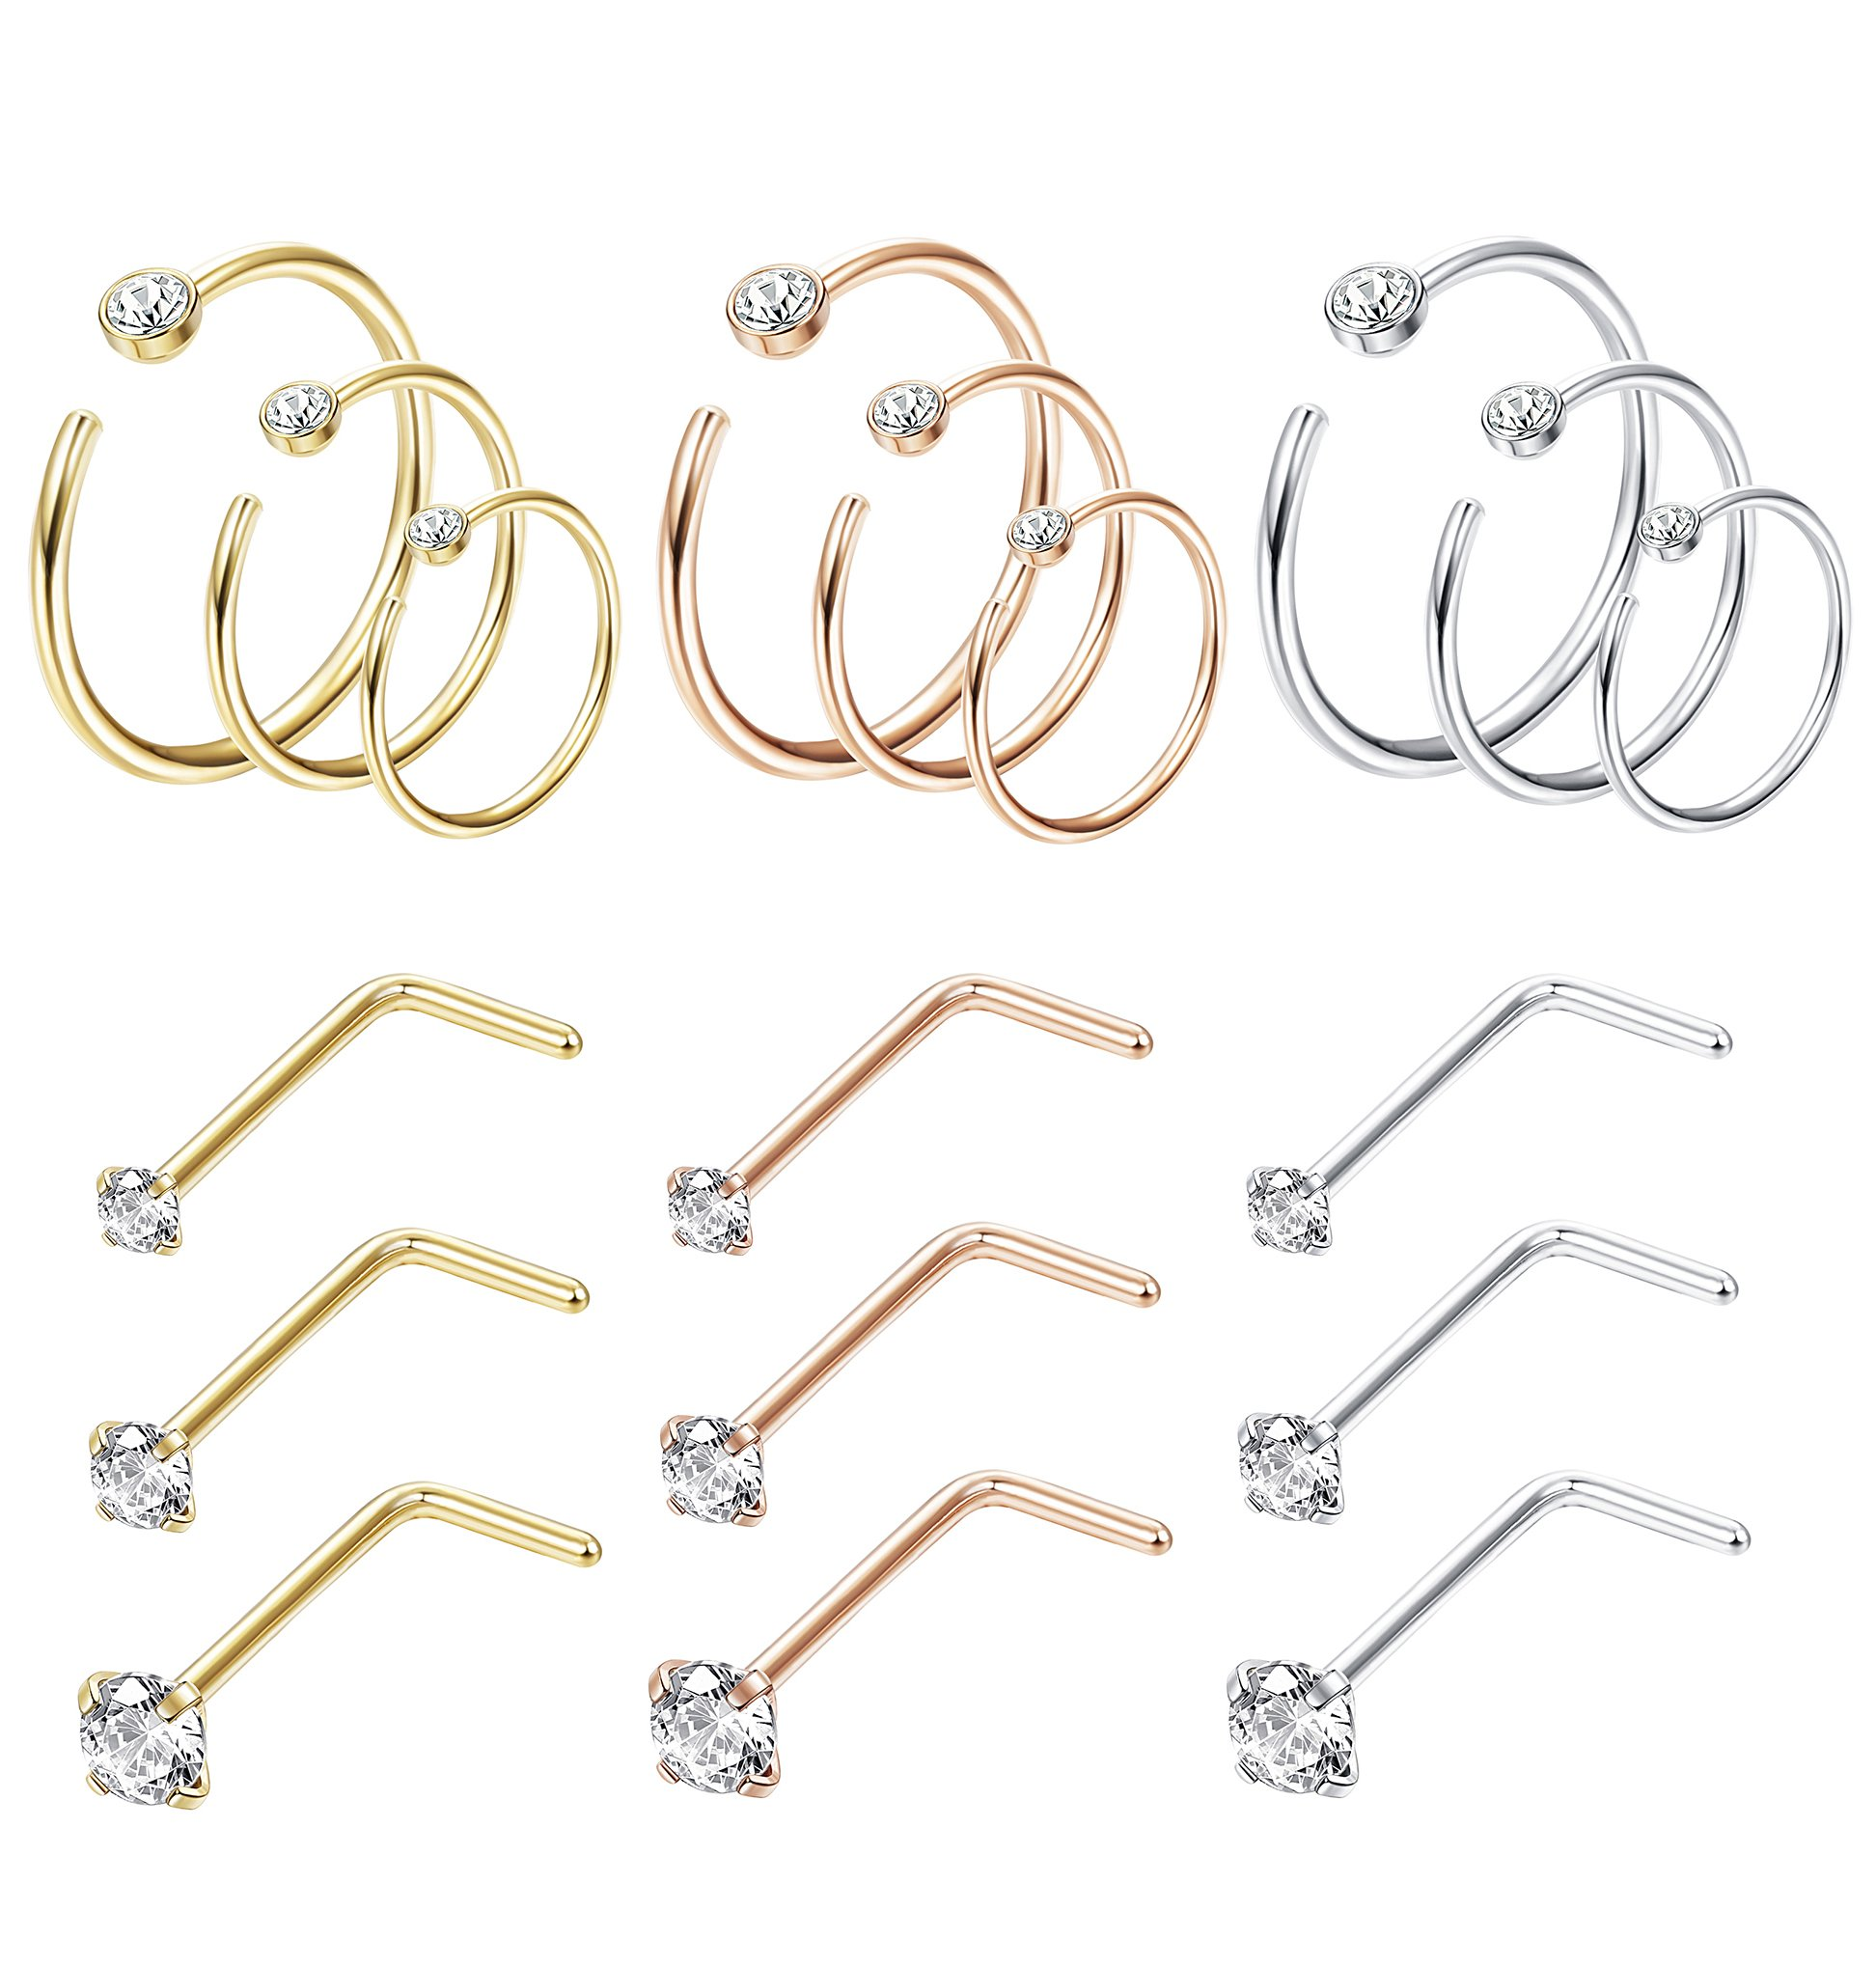 Thunaraz 18Pcs 20G Stainless Steel CZ Stud Screws Rings Set Nose Ring Hoop Cartilage Hoop Ear Septum Piercing For Women Men